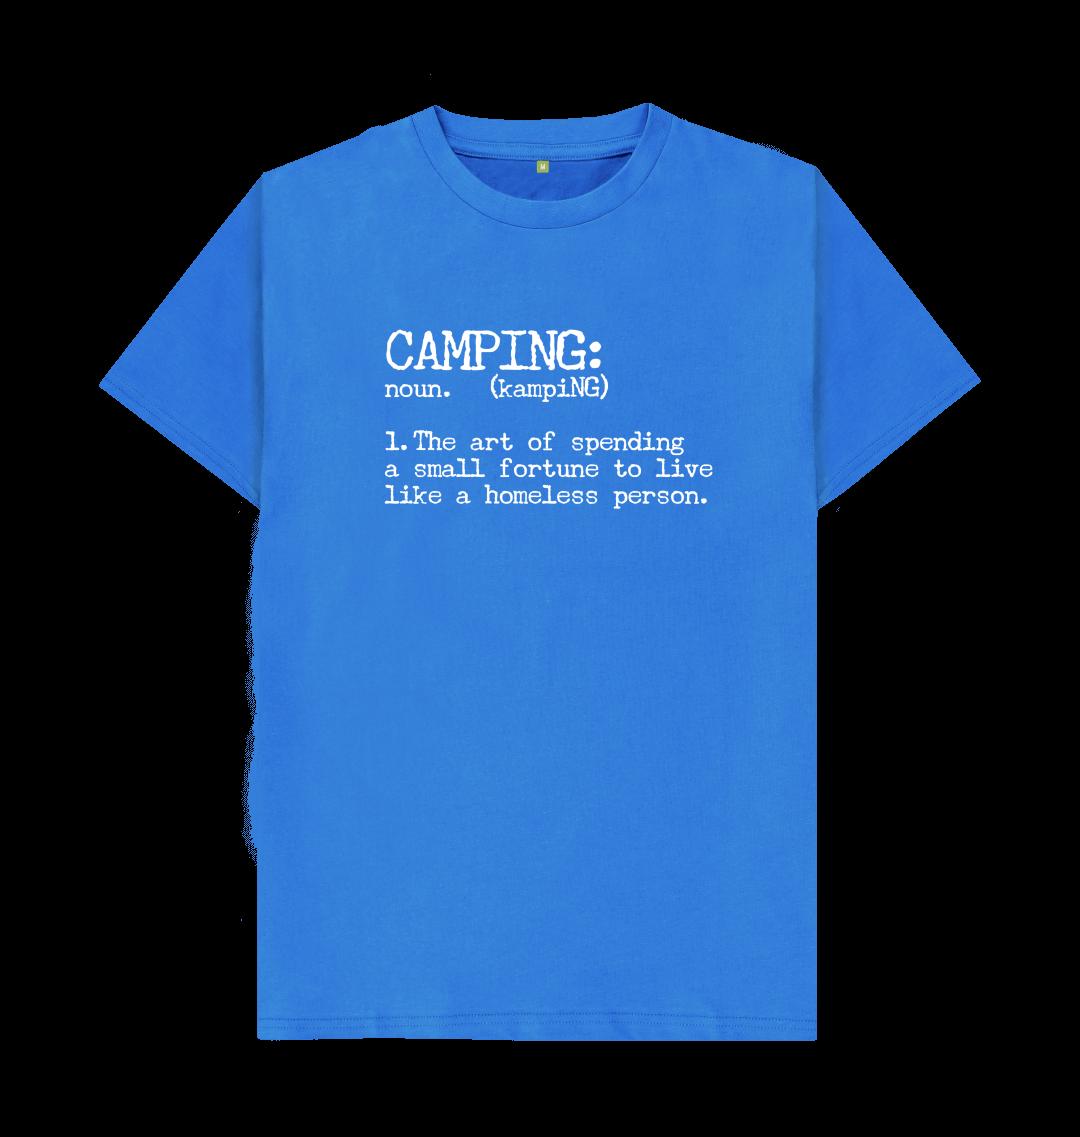 Camping Definition Funny Mens T Shirt Top - Organic Cotton, Vegan blue